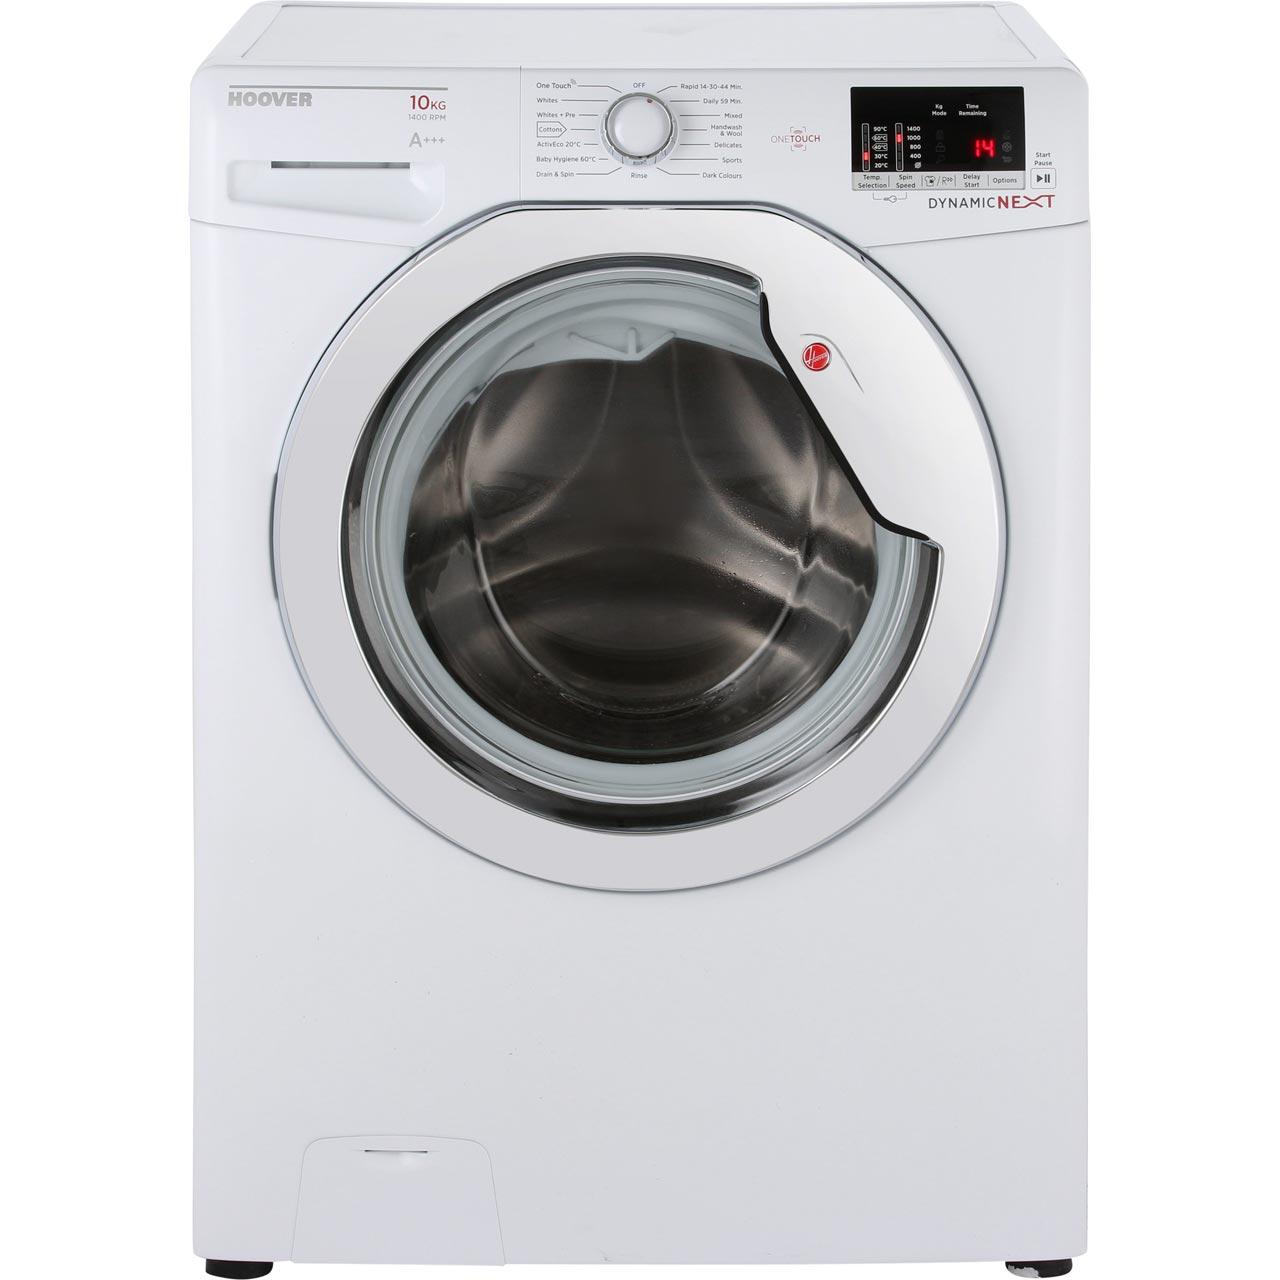 General Electric Washing Machine Wiring Diagram Wwa8858malad